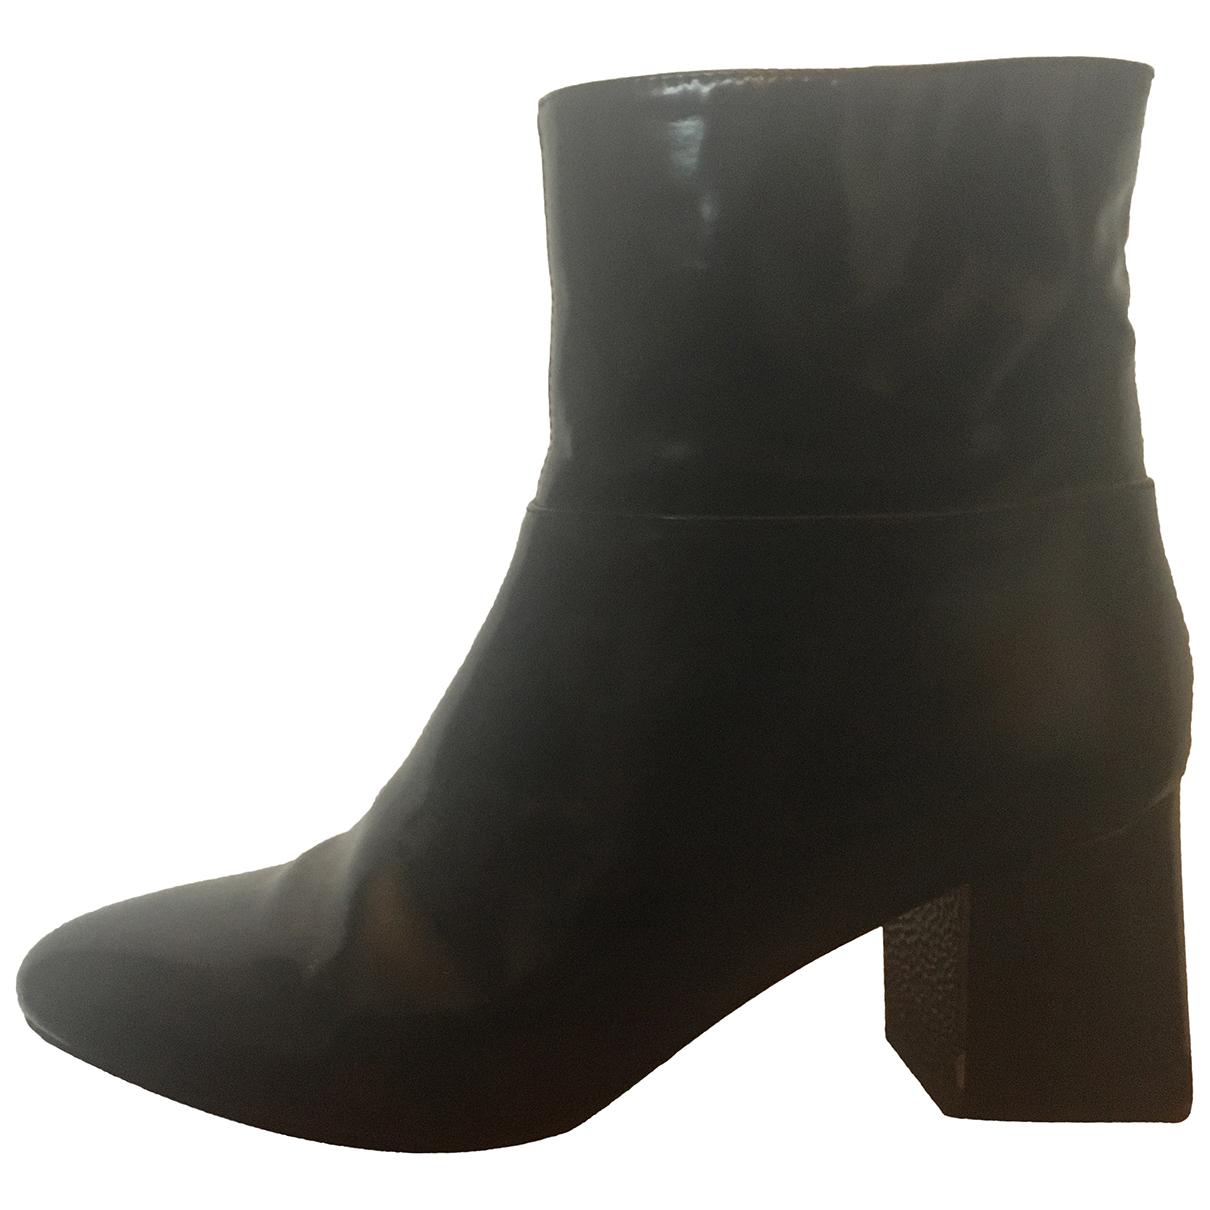 Jil Sander N Black Patent leather Espadrilles for Women 38 EU